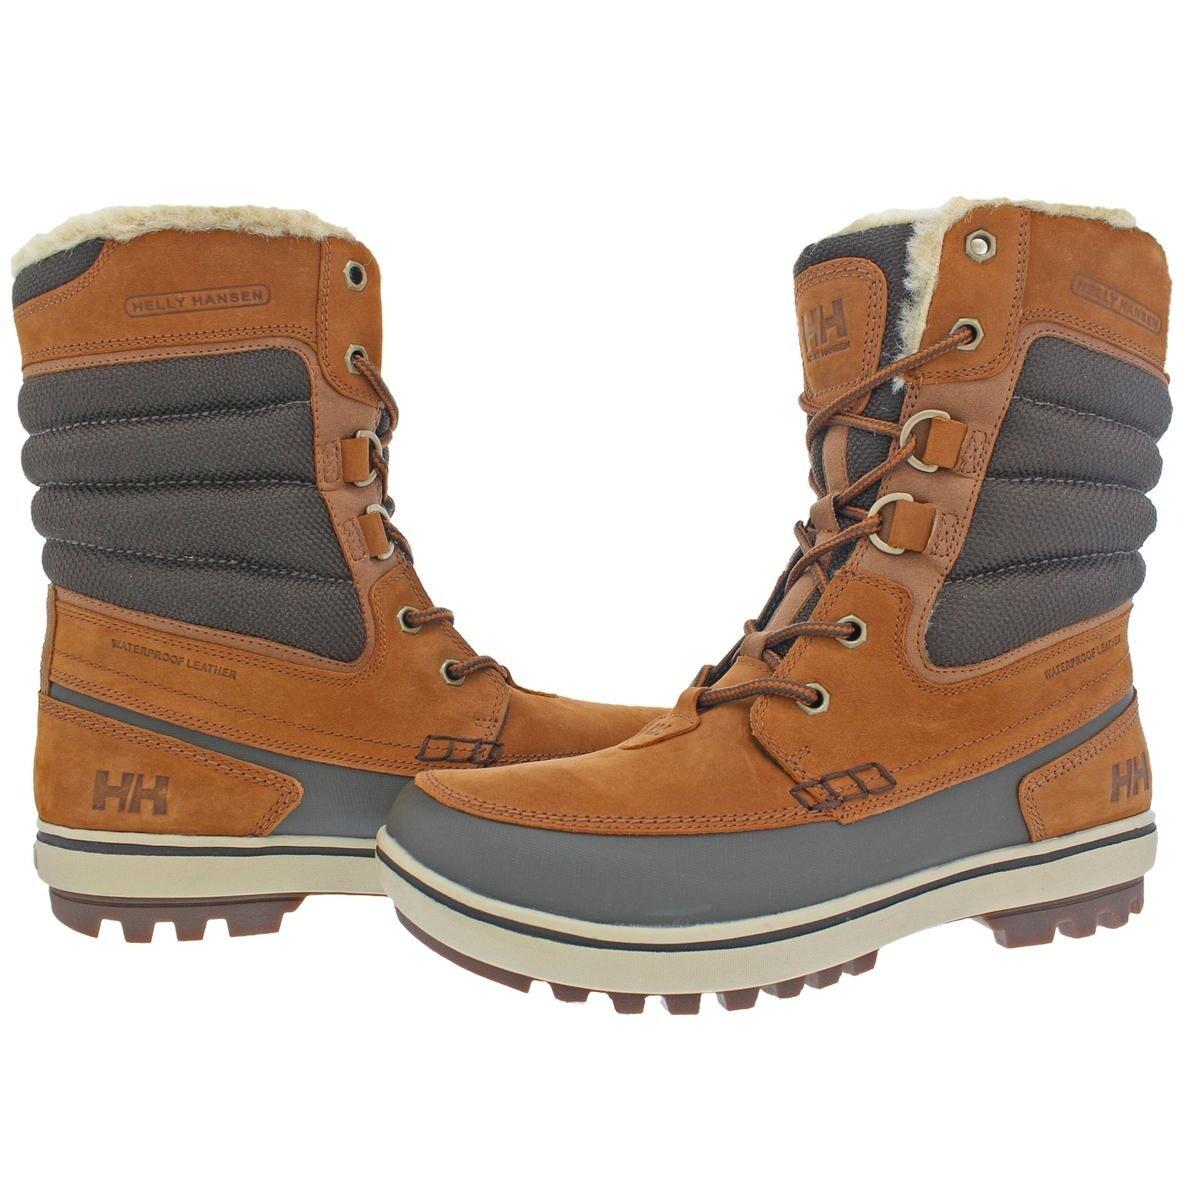 f467a0d8bcb Helly Hansen Mens Garibaldi 2 Winter Boots Waterproof HellyGrip - 9.5  medium (d)